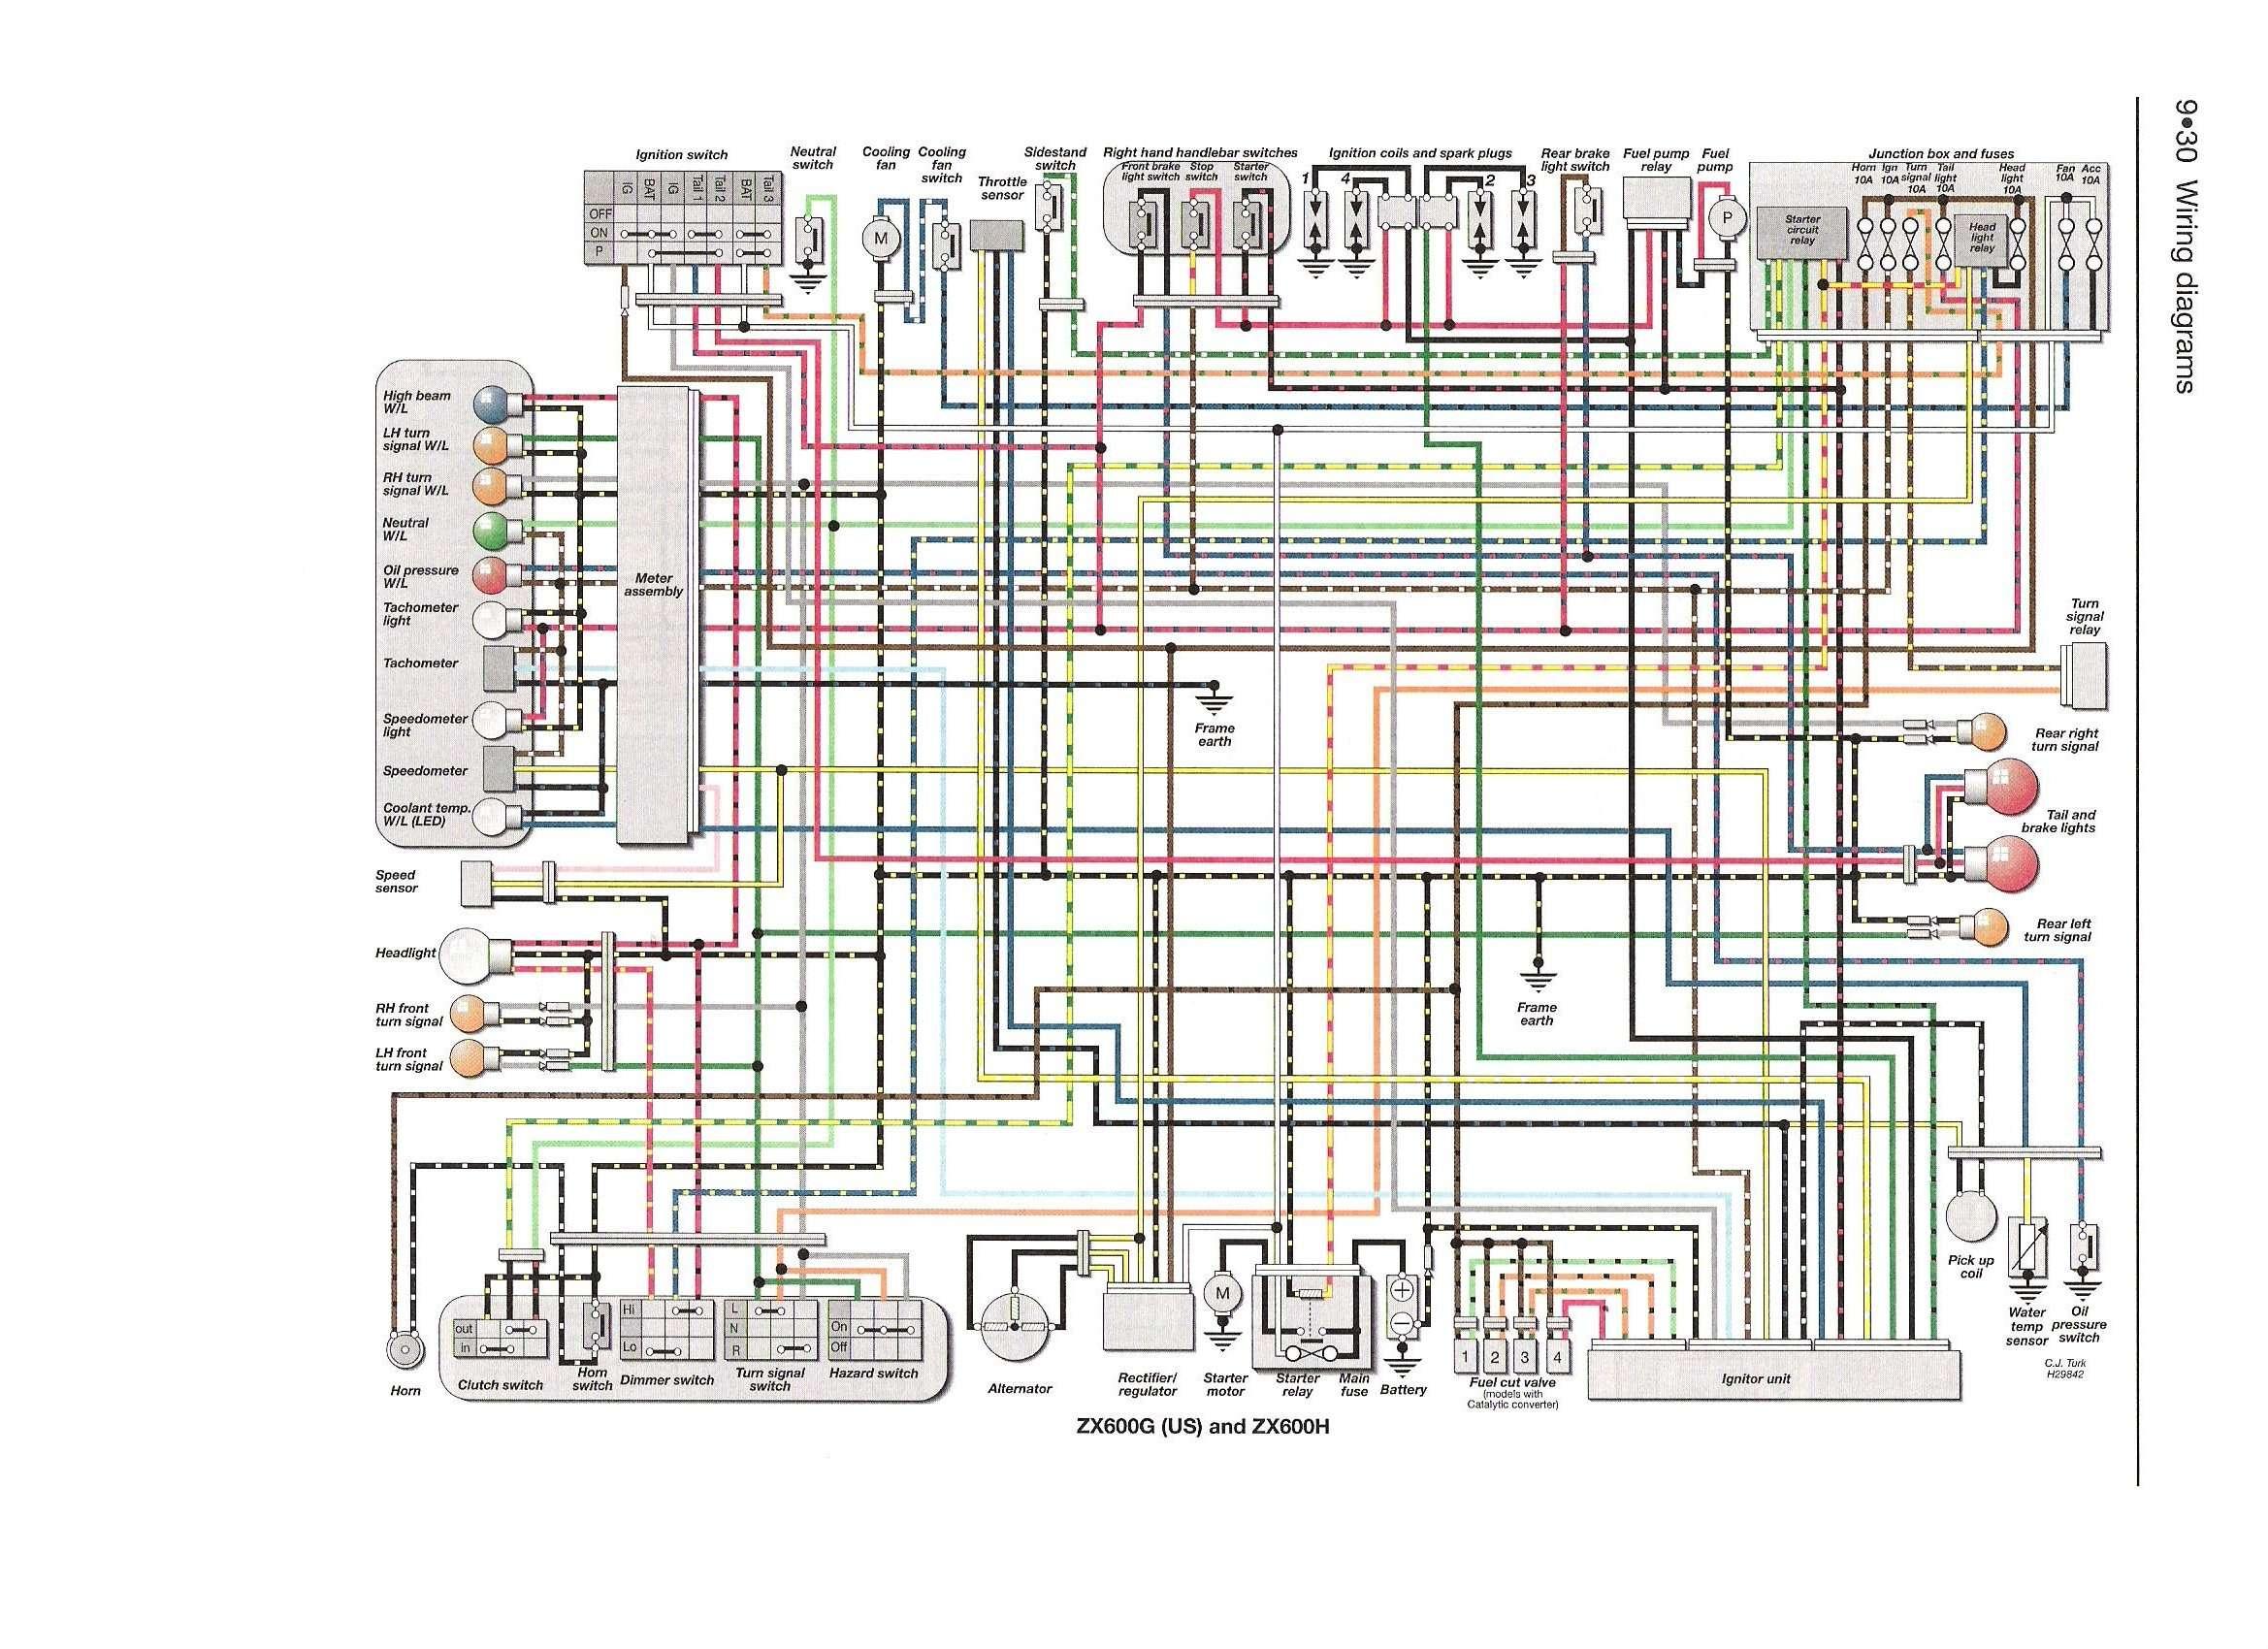 [DIAGRAM_38IS]  MN_1349] Zl600 1996 Motorcycle Wiring Diagram All About Wiring Diagrams  Schematic Wiring | Zx10 Wiring Diagram |  | Ifica Eatte Mohammedshrine Librar Wiring 101